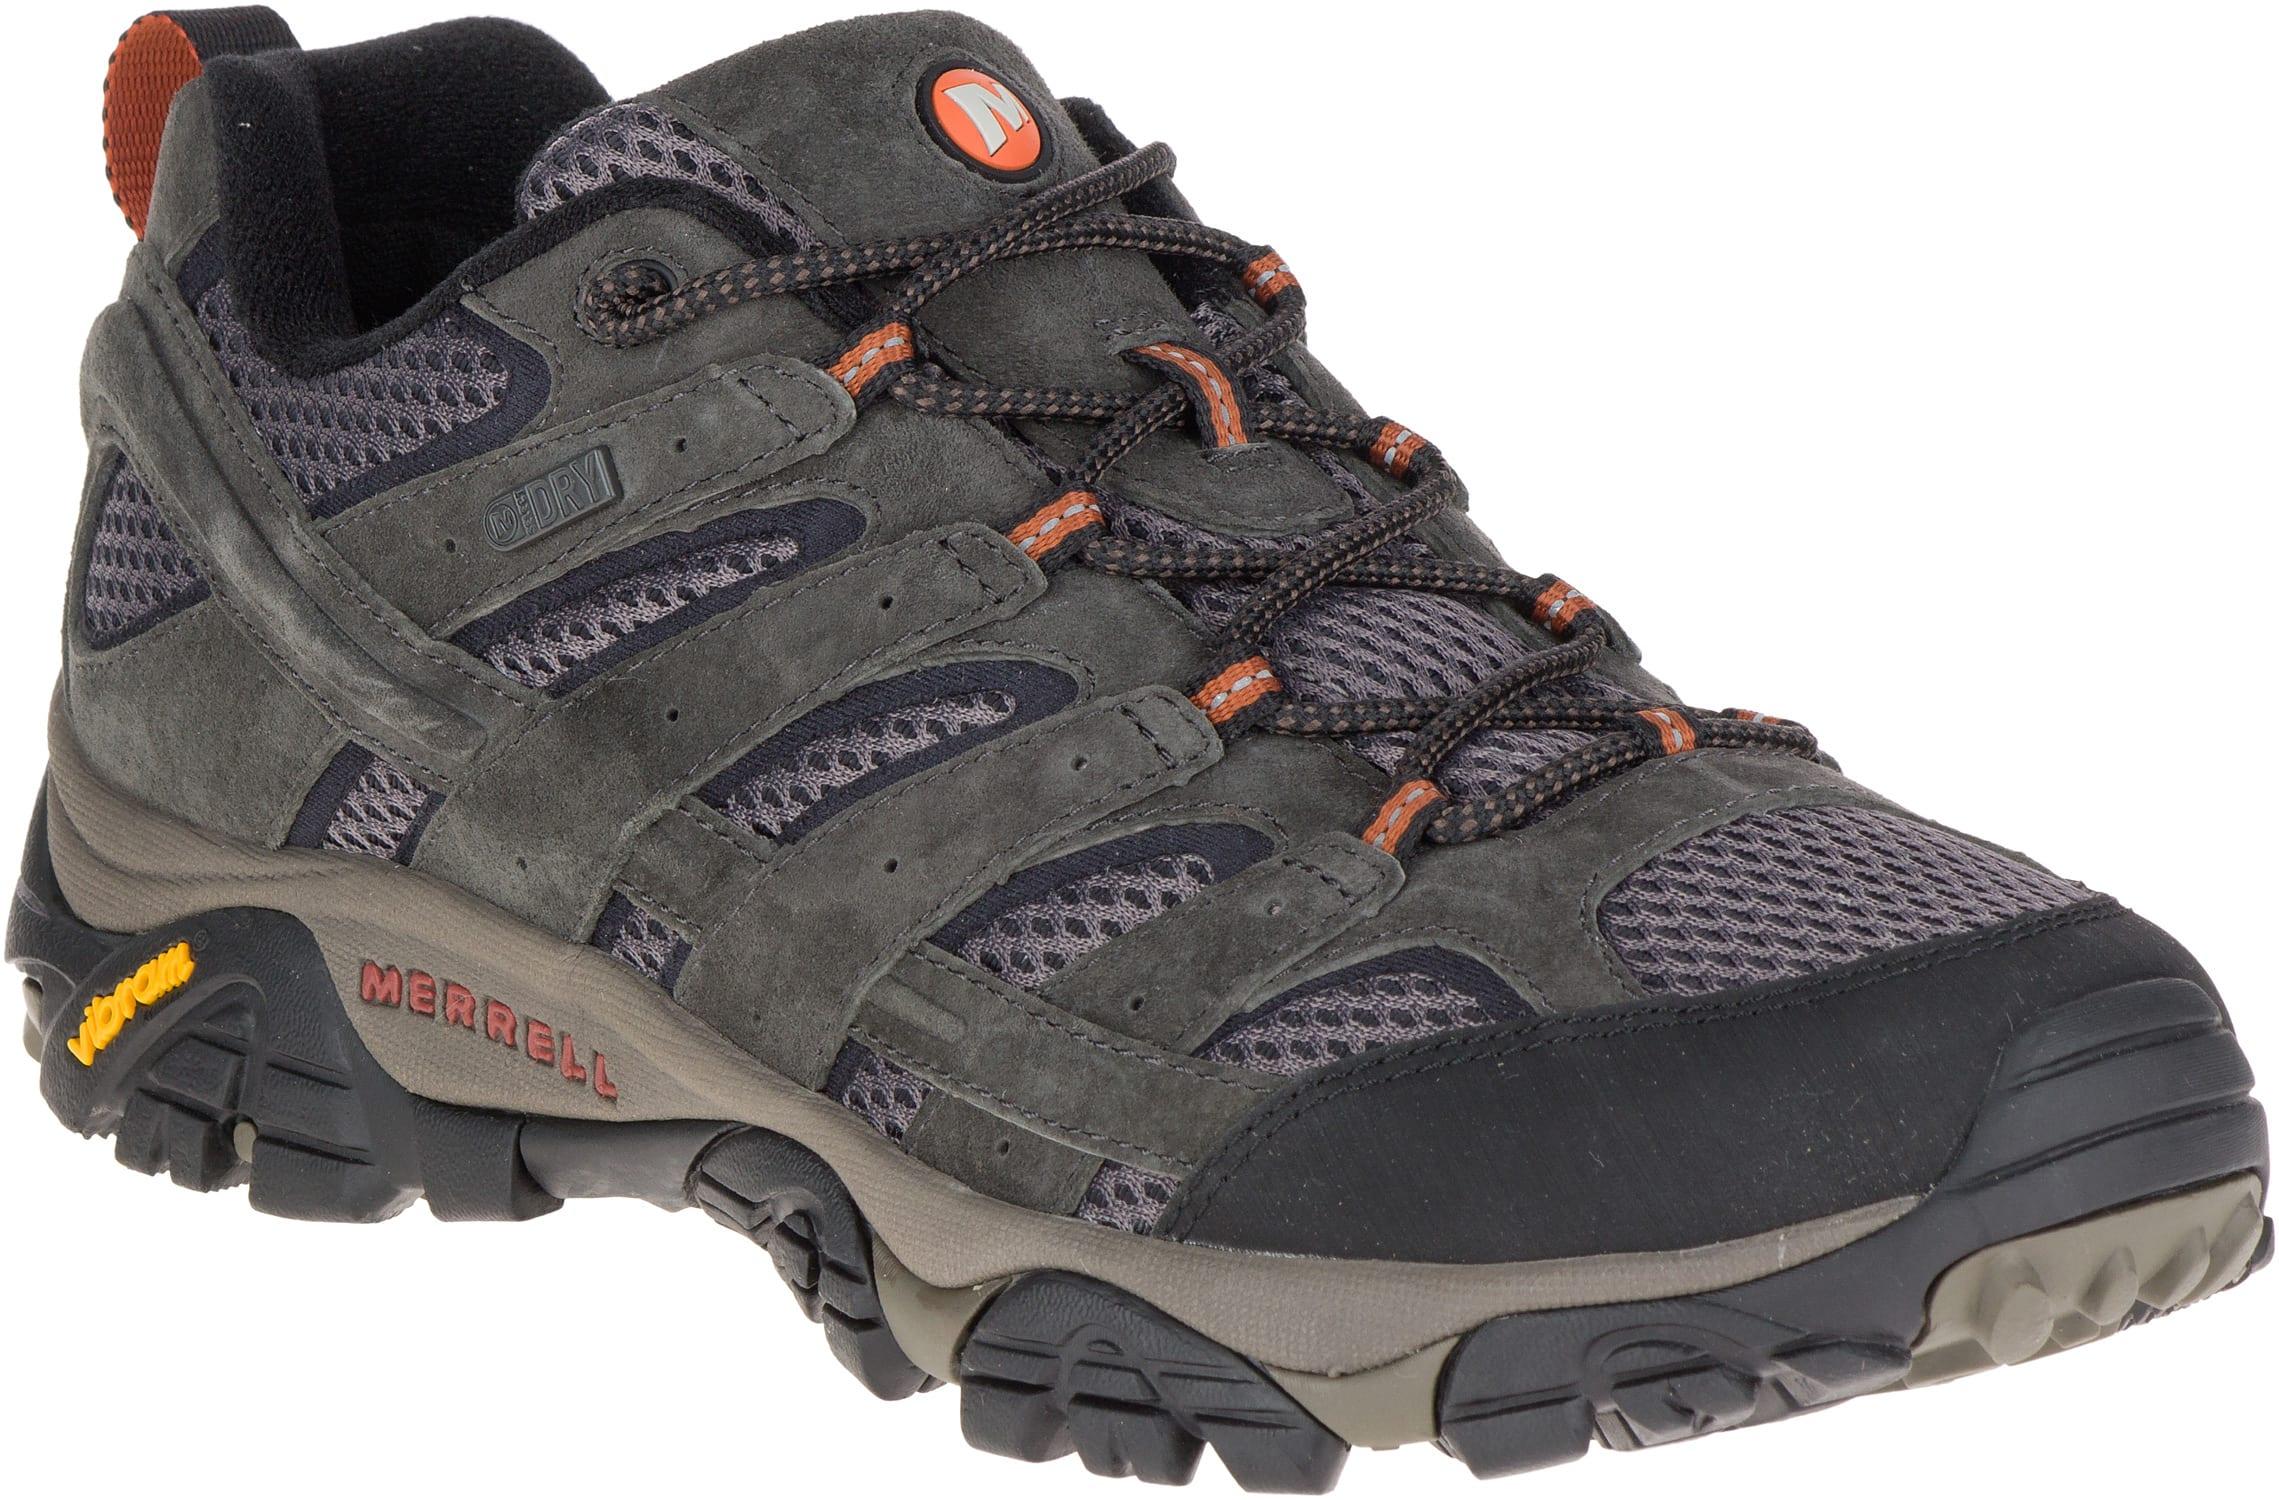 Merrell Moab 2 Waterproof Hiking Shoes 2018